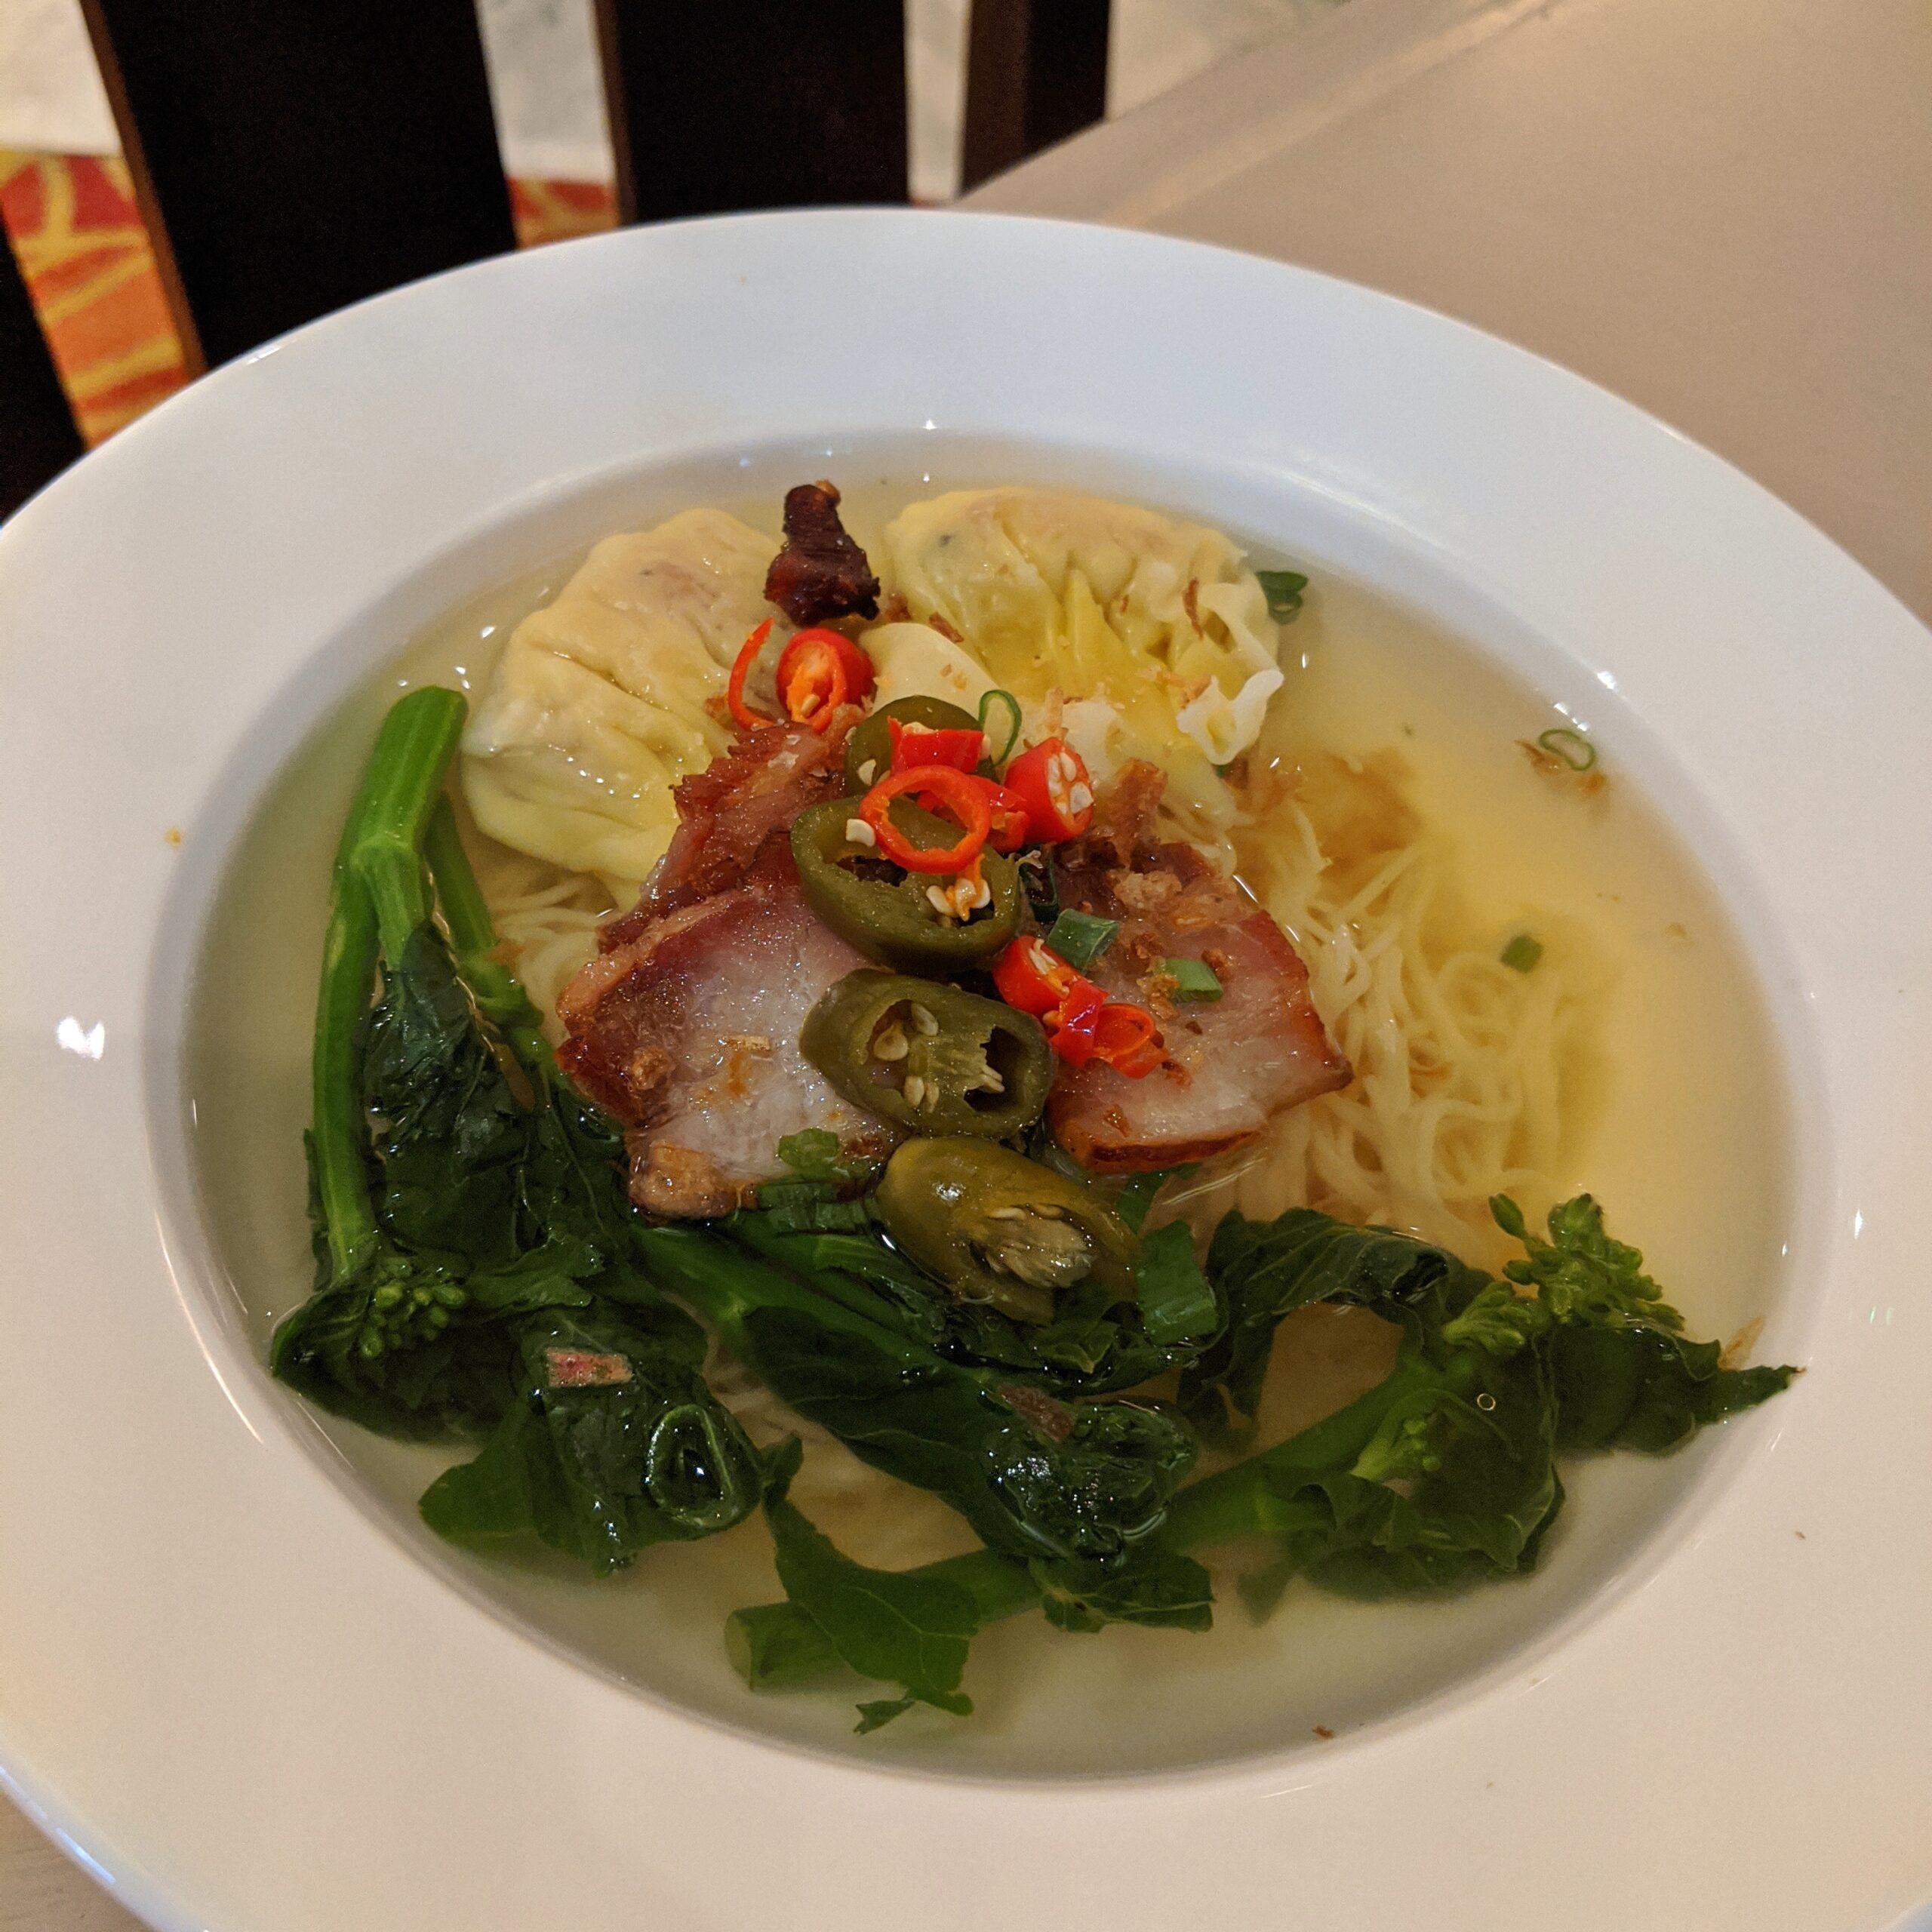 mandarin oriental singapore breakfast melt cafe prawn noodle soup with kurobuta pork char siew